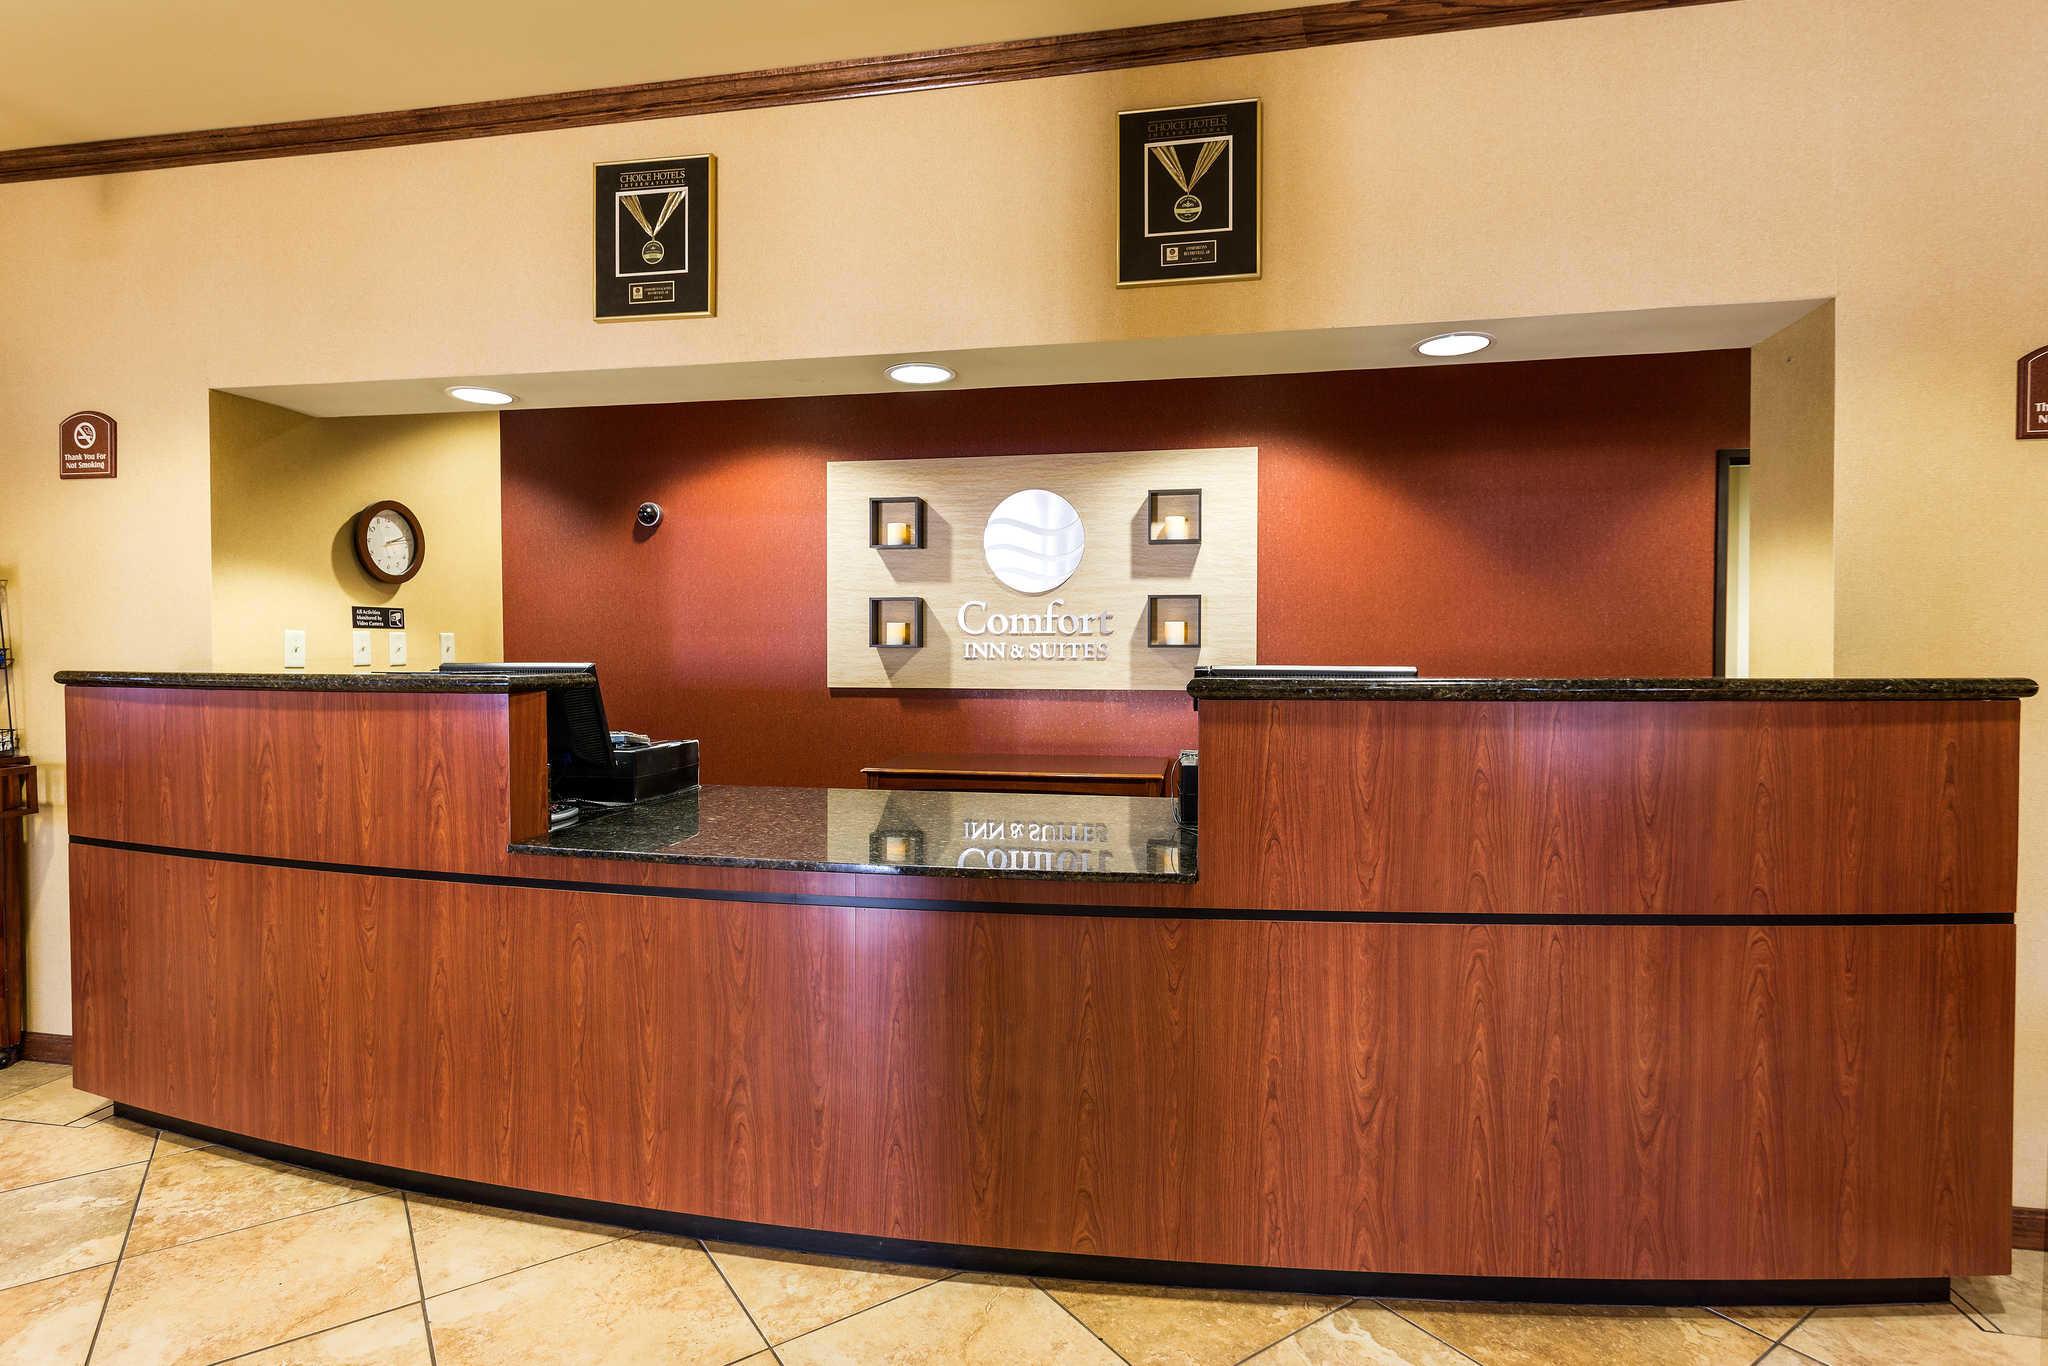 Comfort Inn & Suites image 8